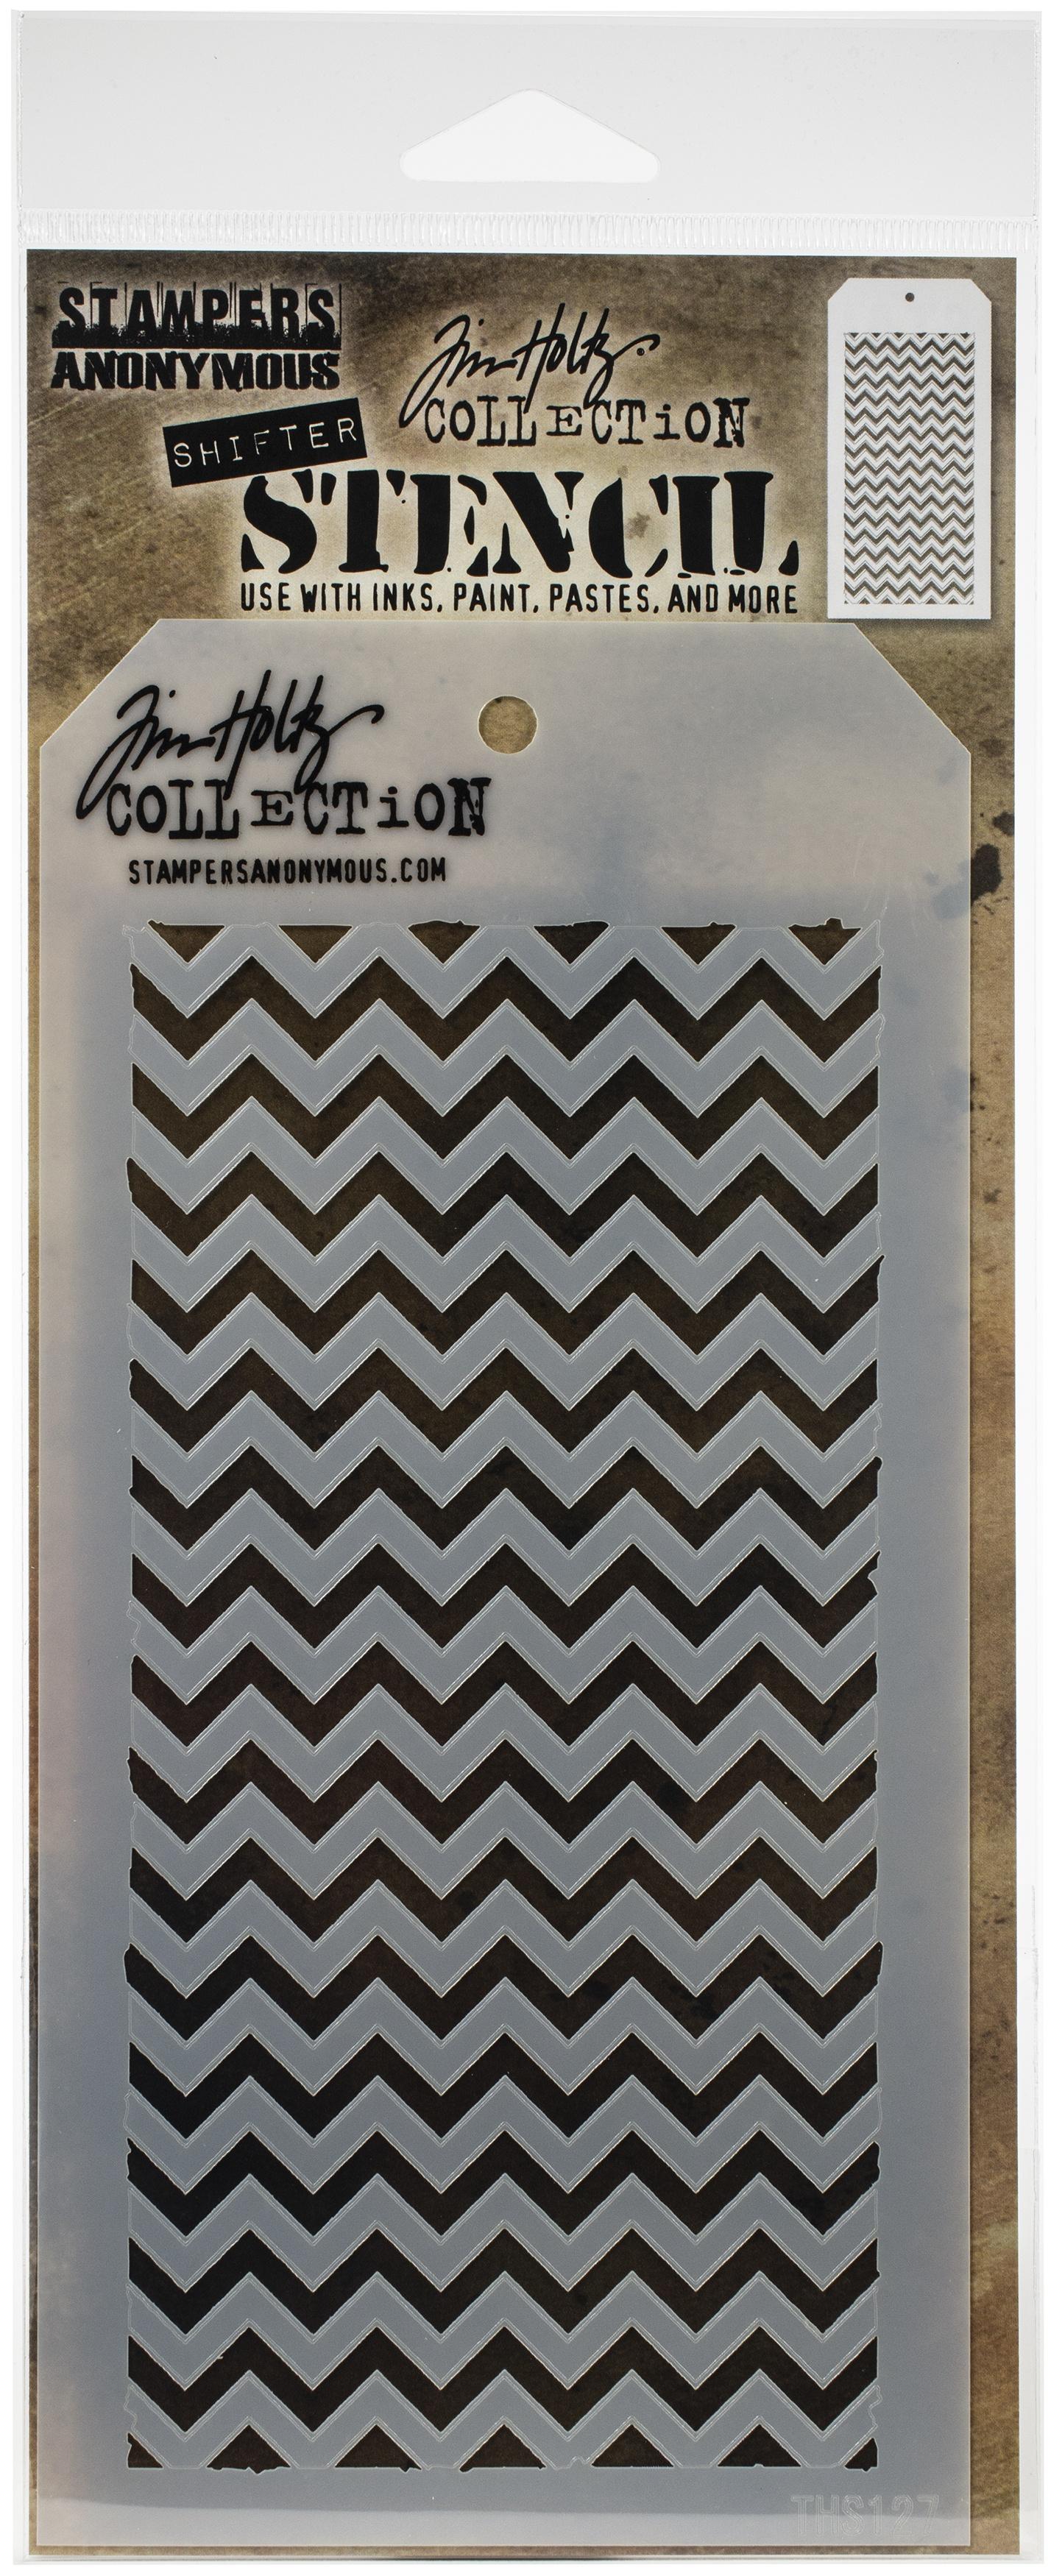 Tim Holtz Layered Stencil 4.125X8.5-Shifter Chevron